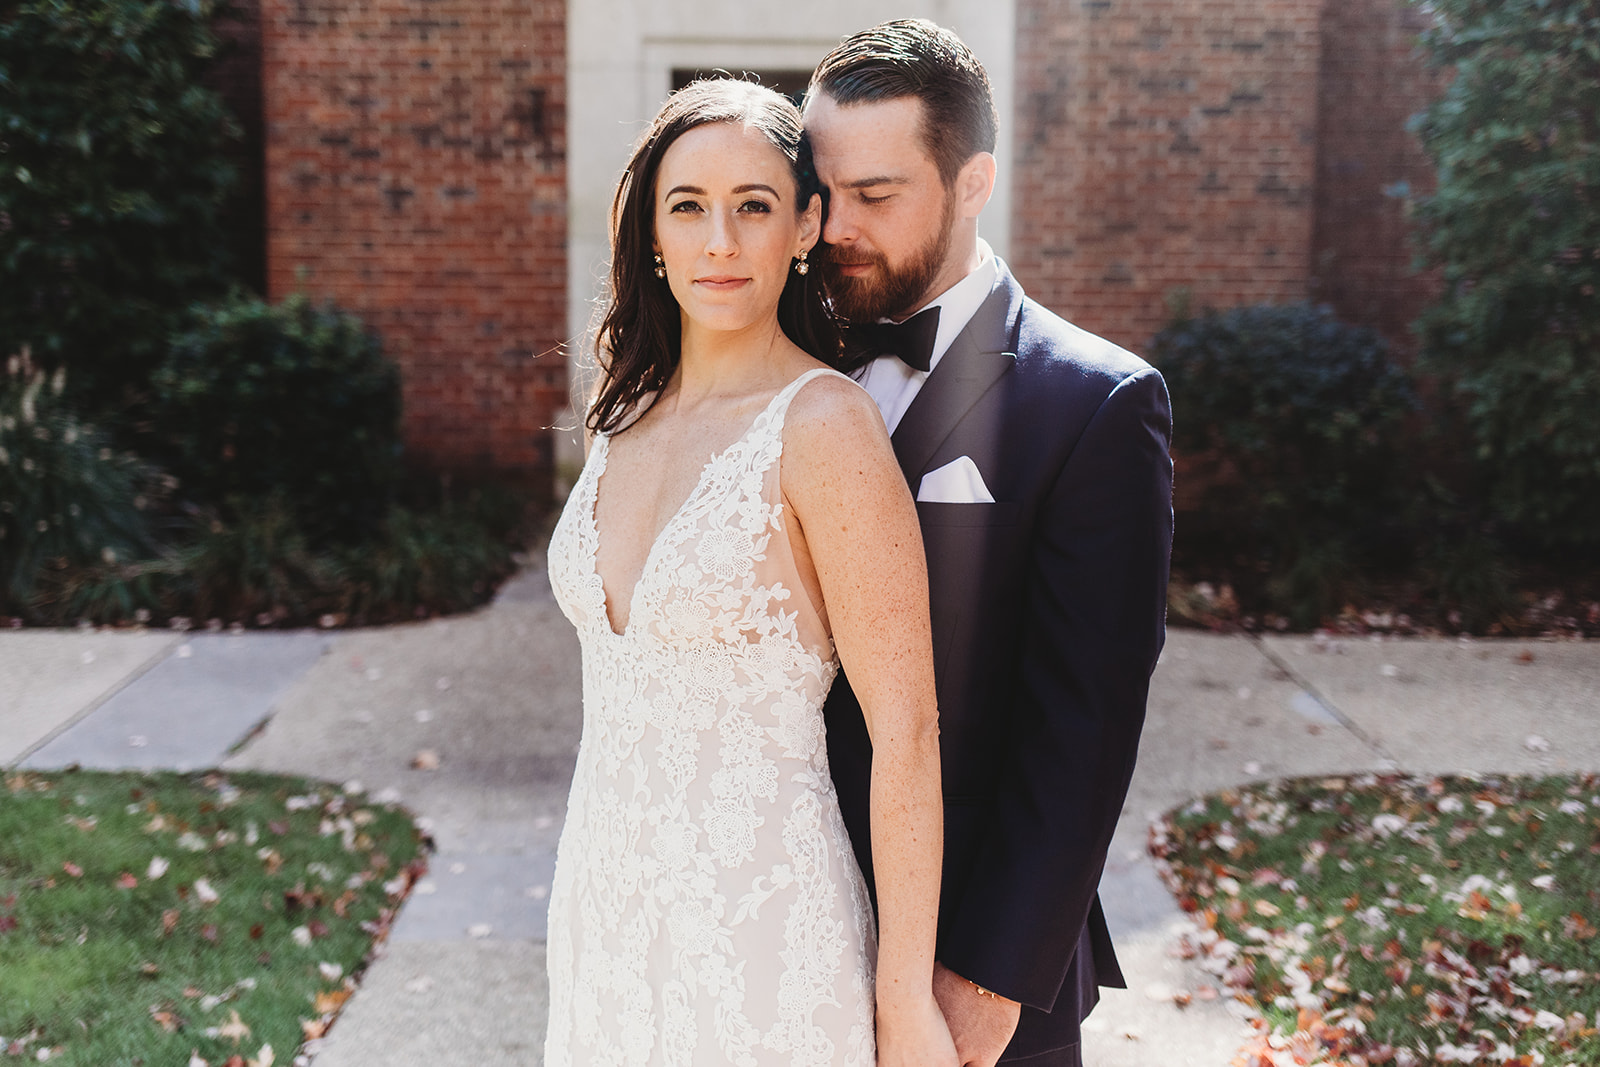 Ryan-Zarichnak-Photography-Pittsburgh-Susan-Evan-Wedding-1526.jpg